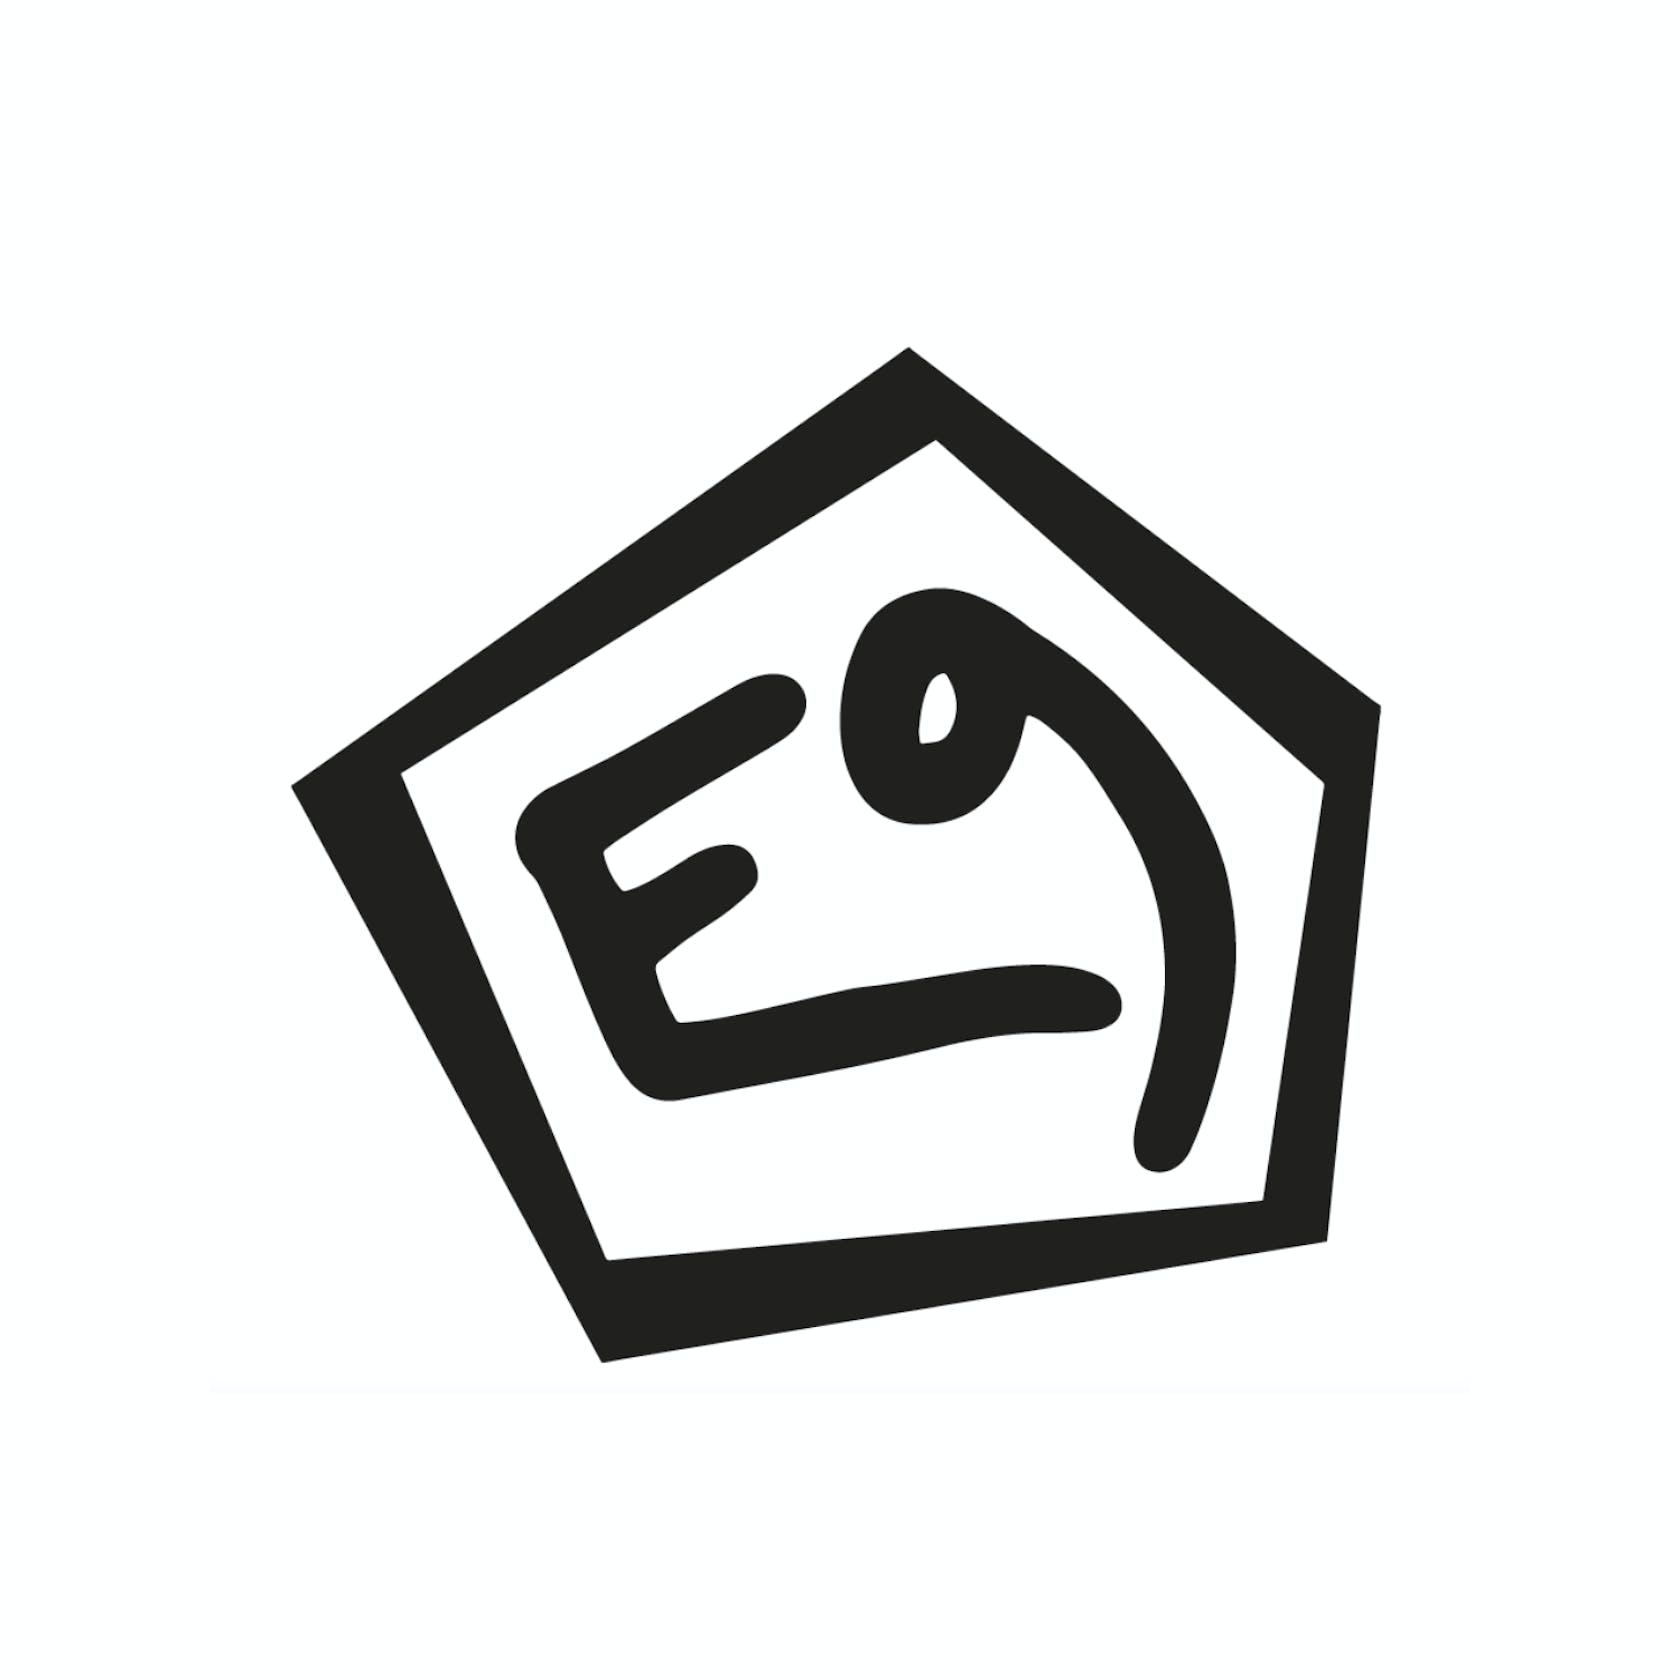 E9 Onlineshop